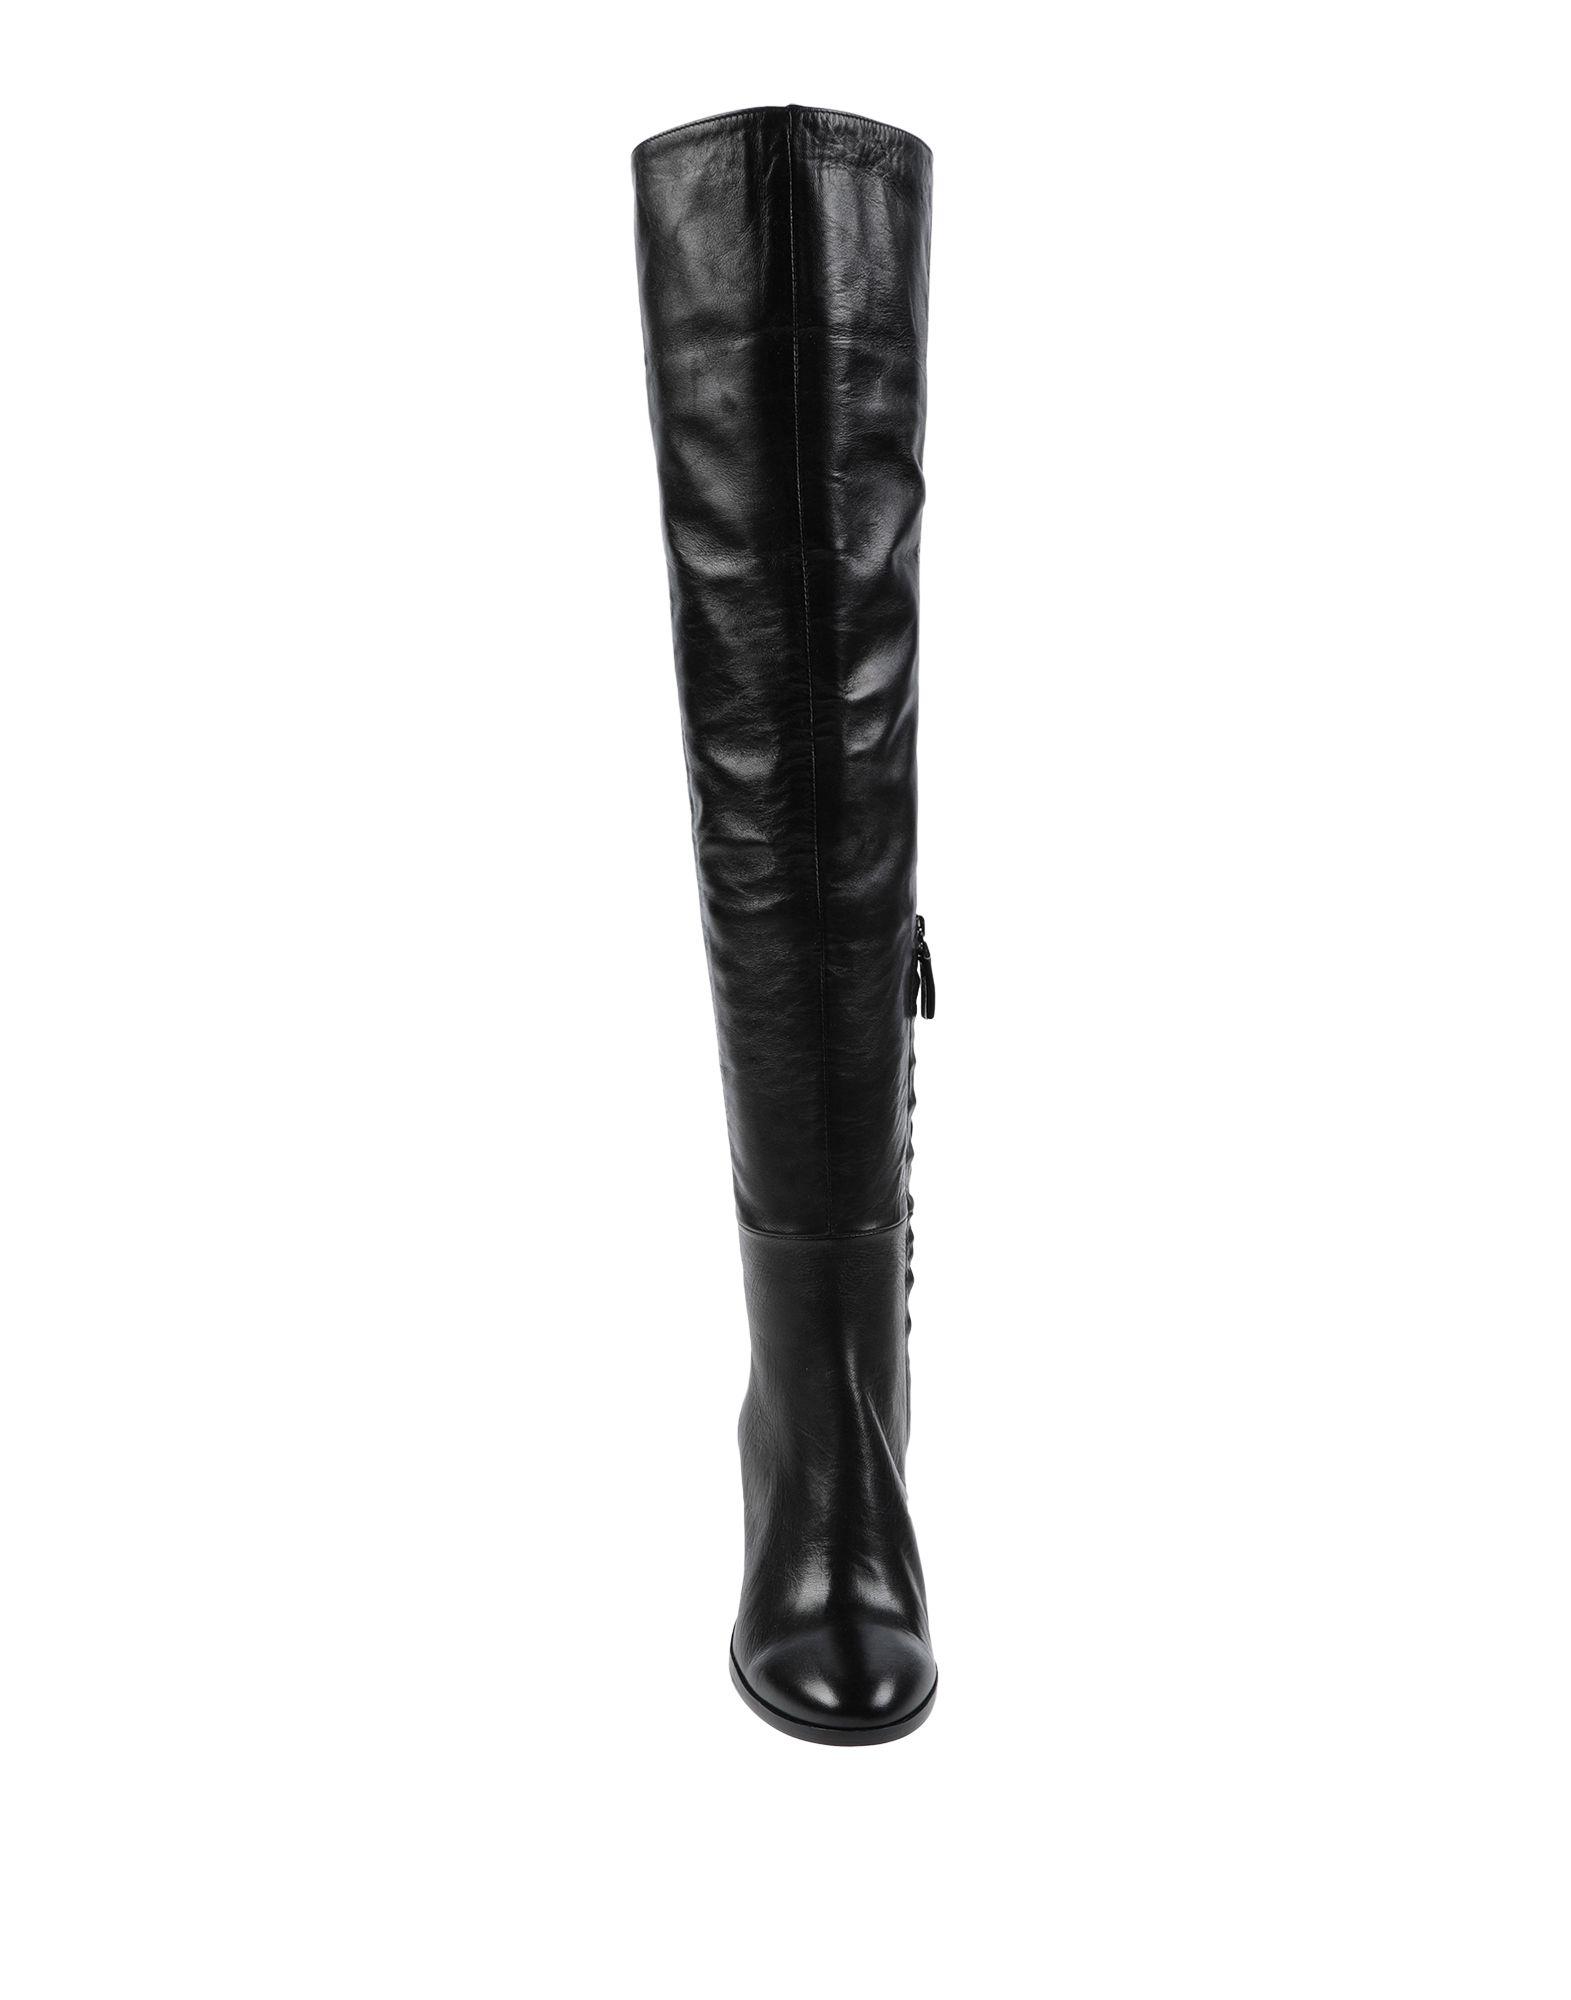 Stilvolle billige Stiefel Schuhe J|D Julie Dee Stiefel billige Damen  11547479VM 7a4881